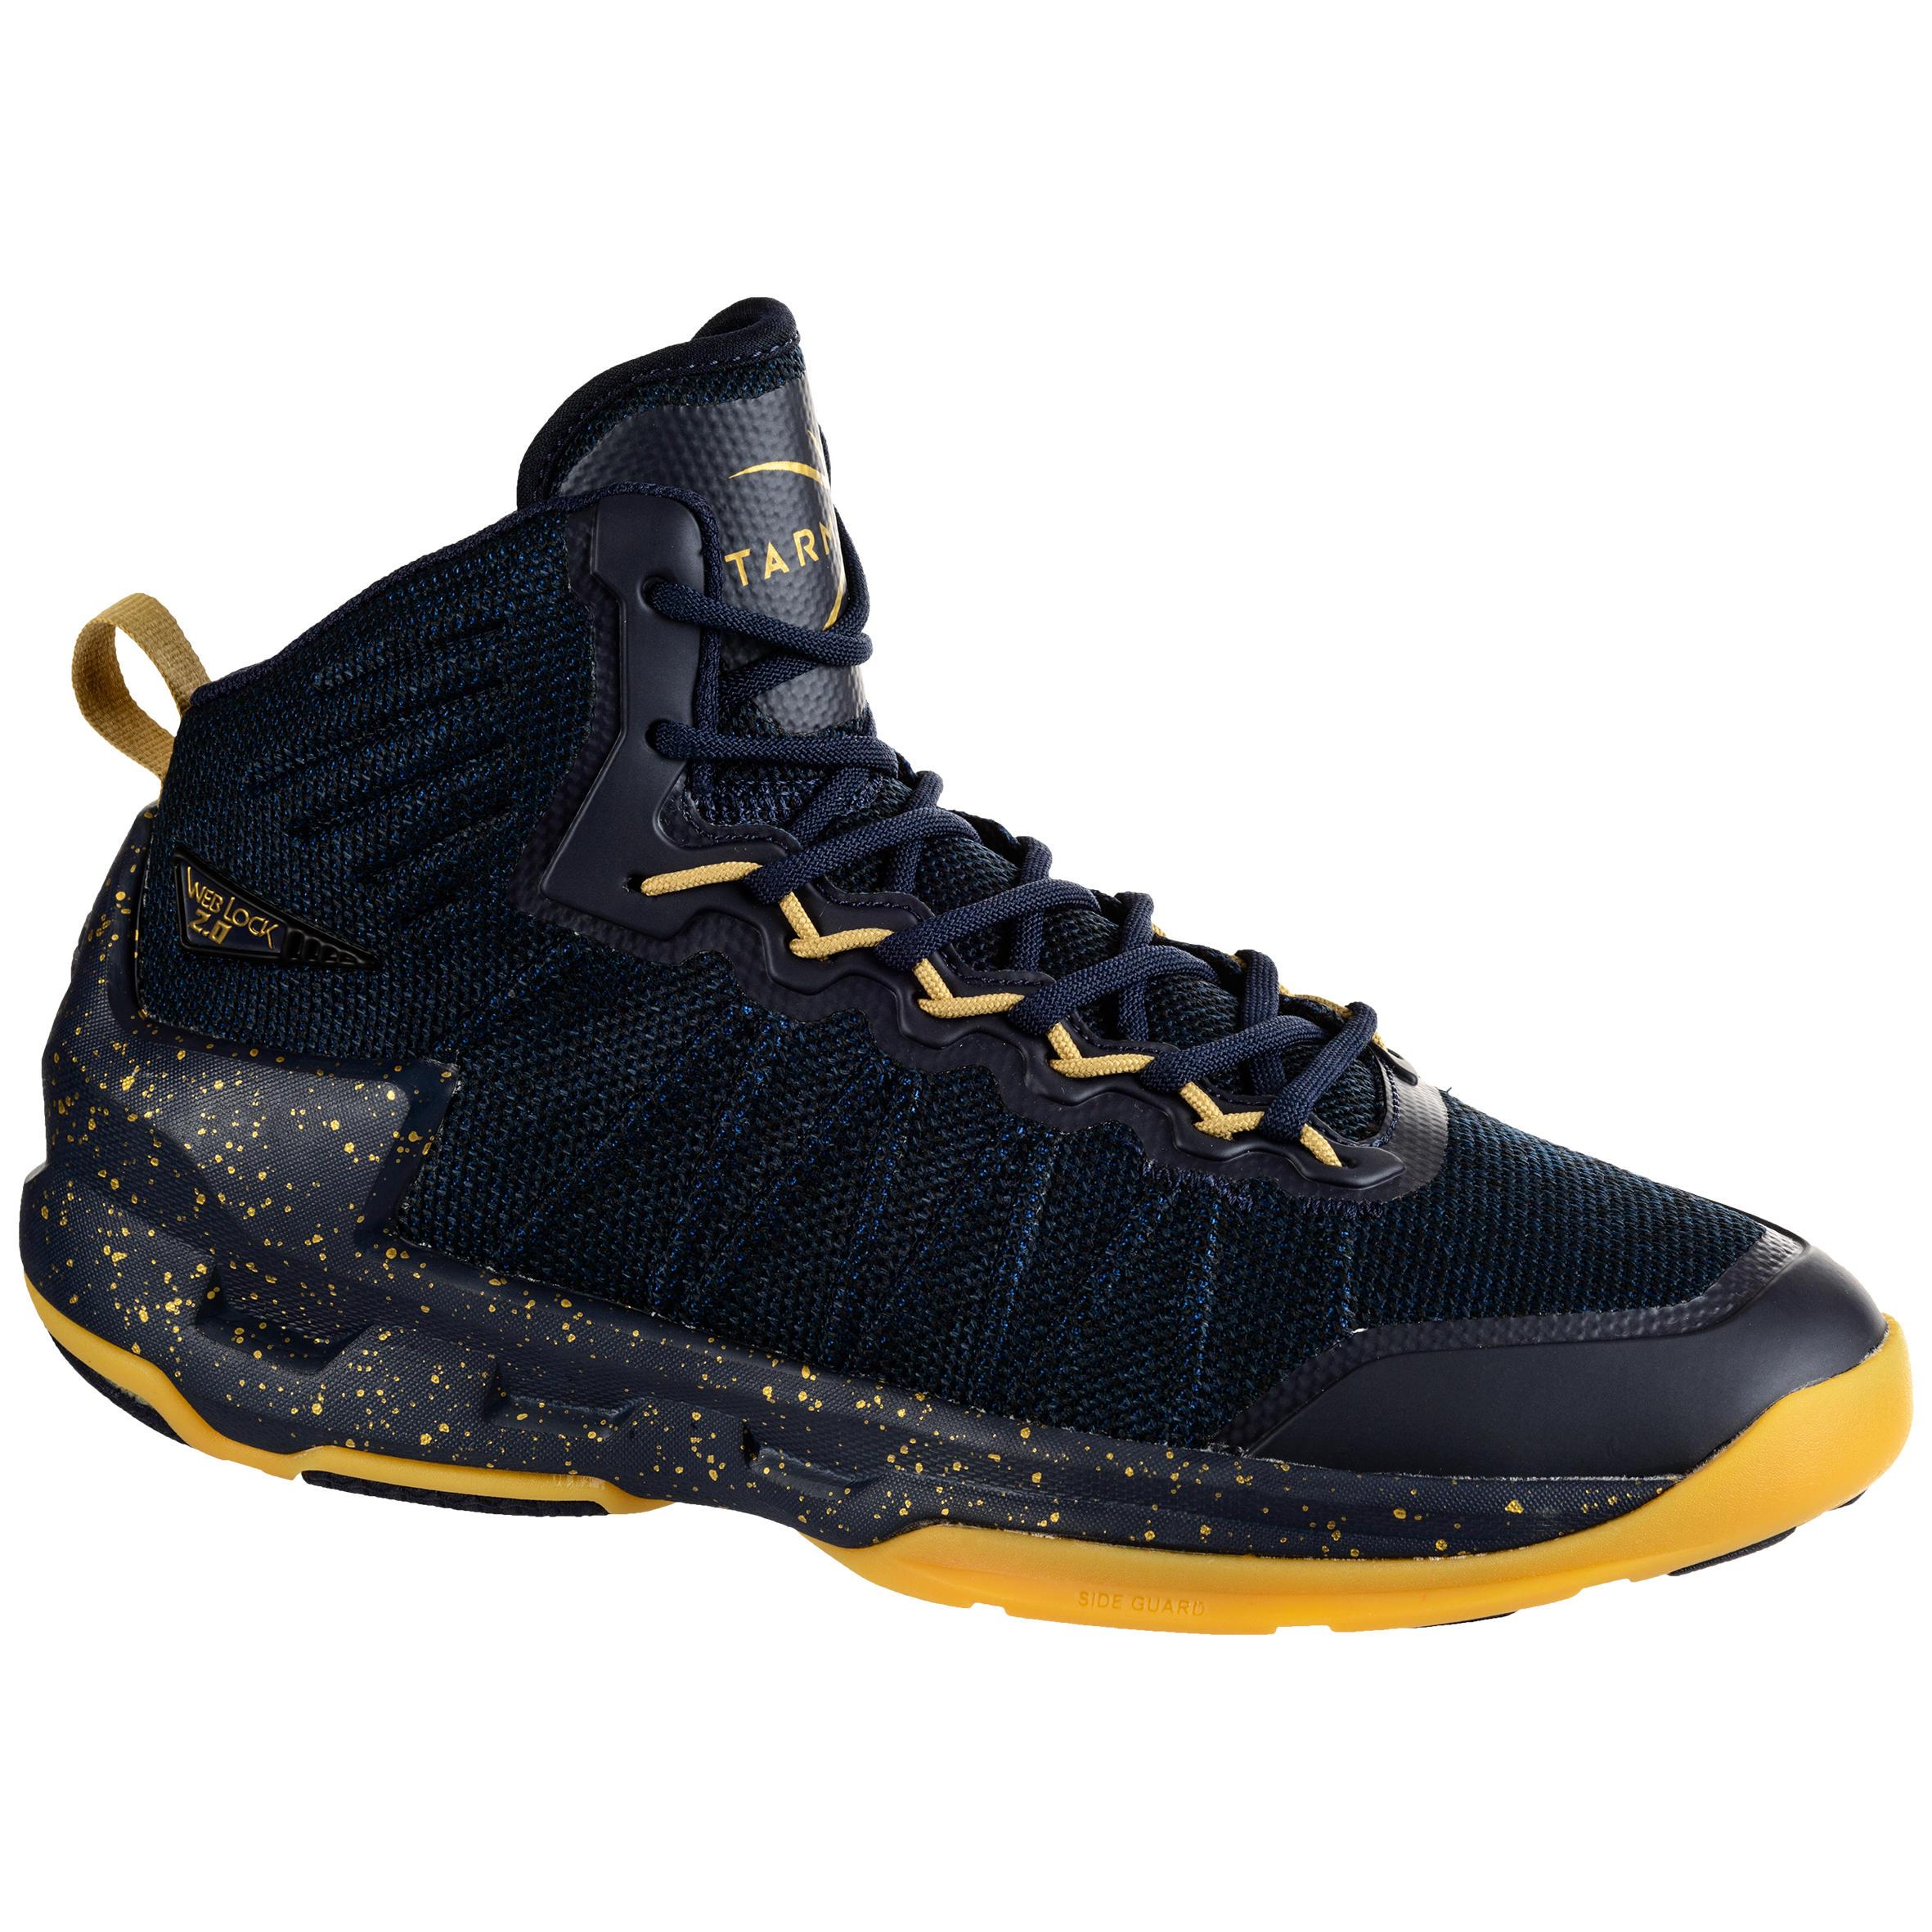 Tarmak Basketbalschoenen Shield 500 zwart/goud (heren)